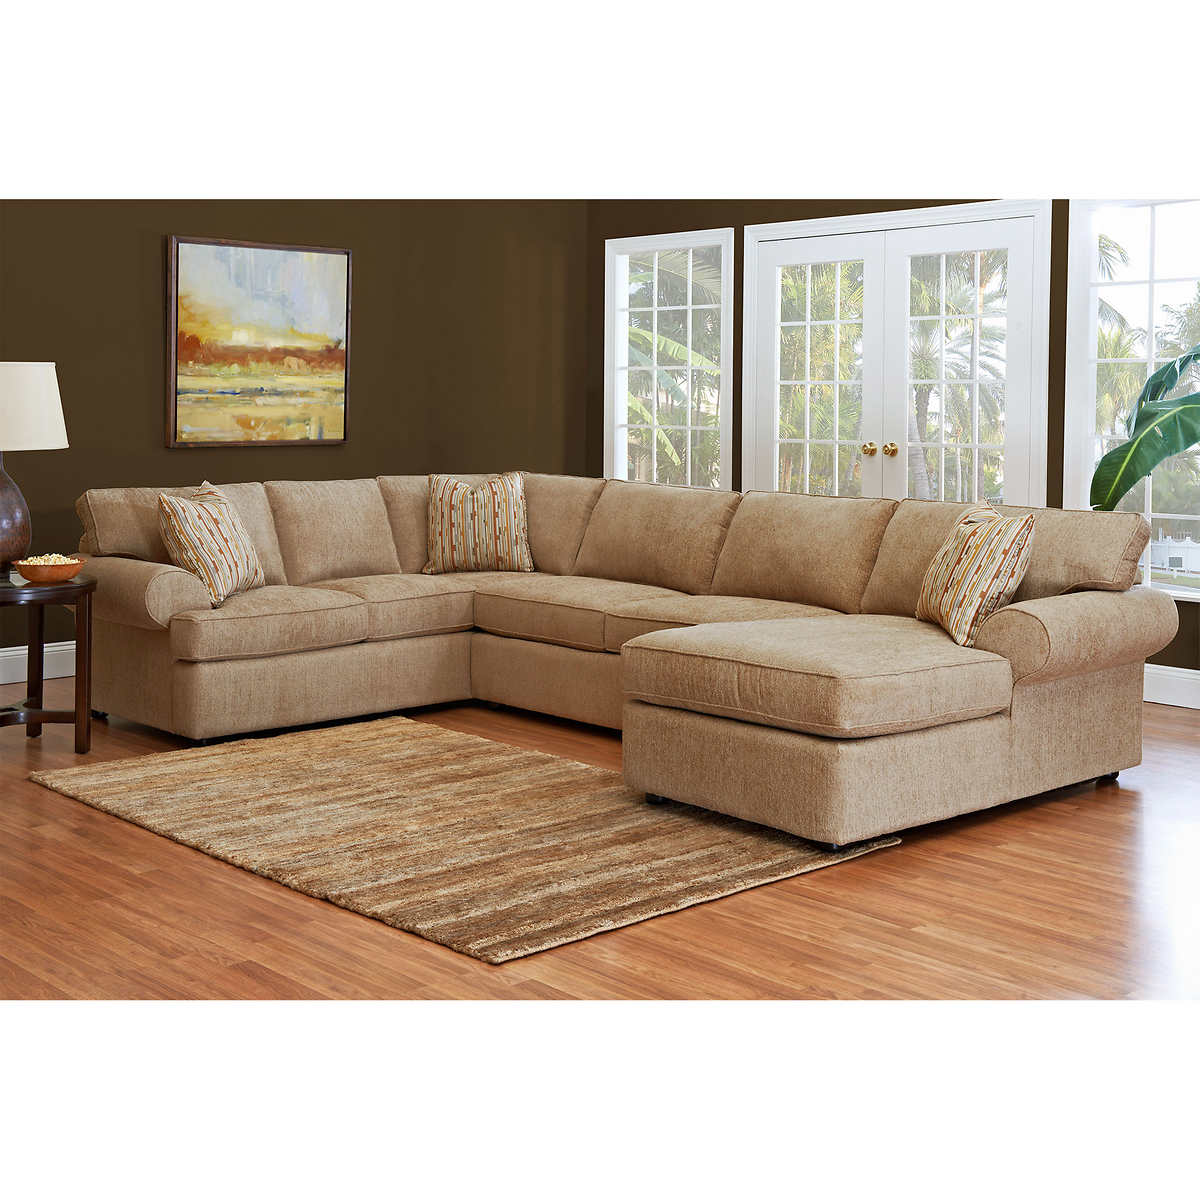 Modular sectional sofa costco farmersagentartruizcom for Hayden 8 piece sectional sofa